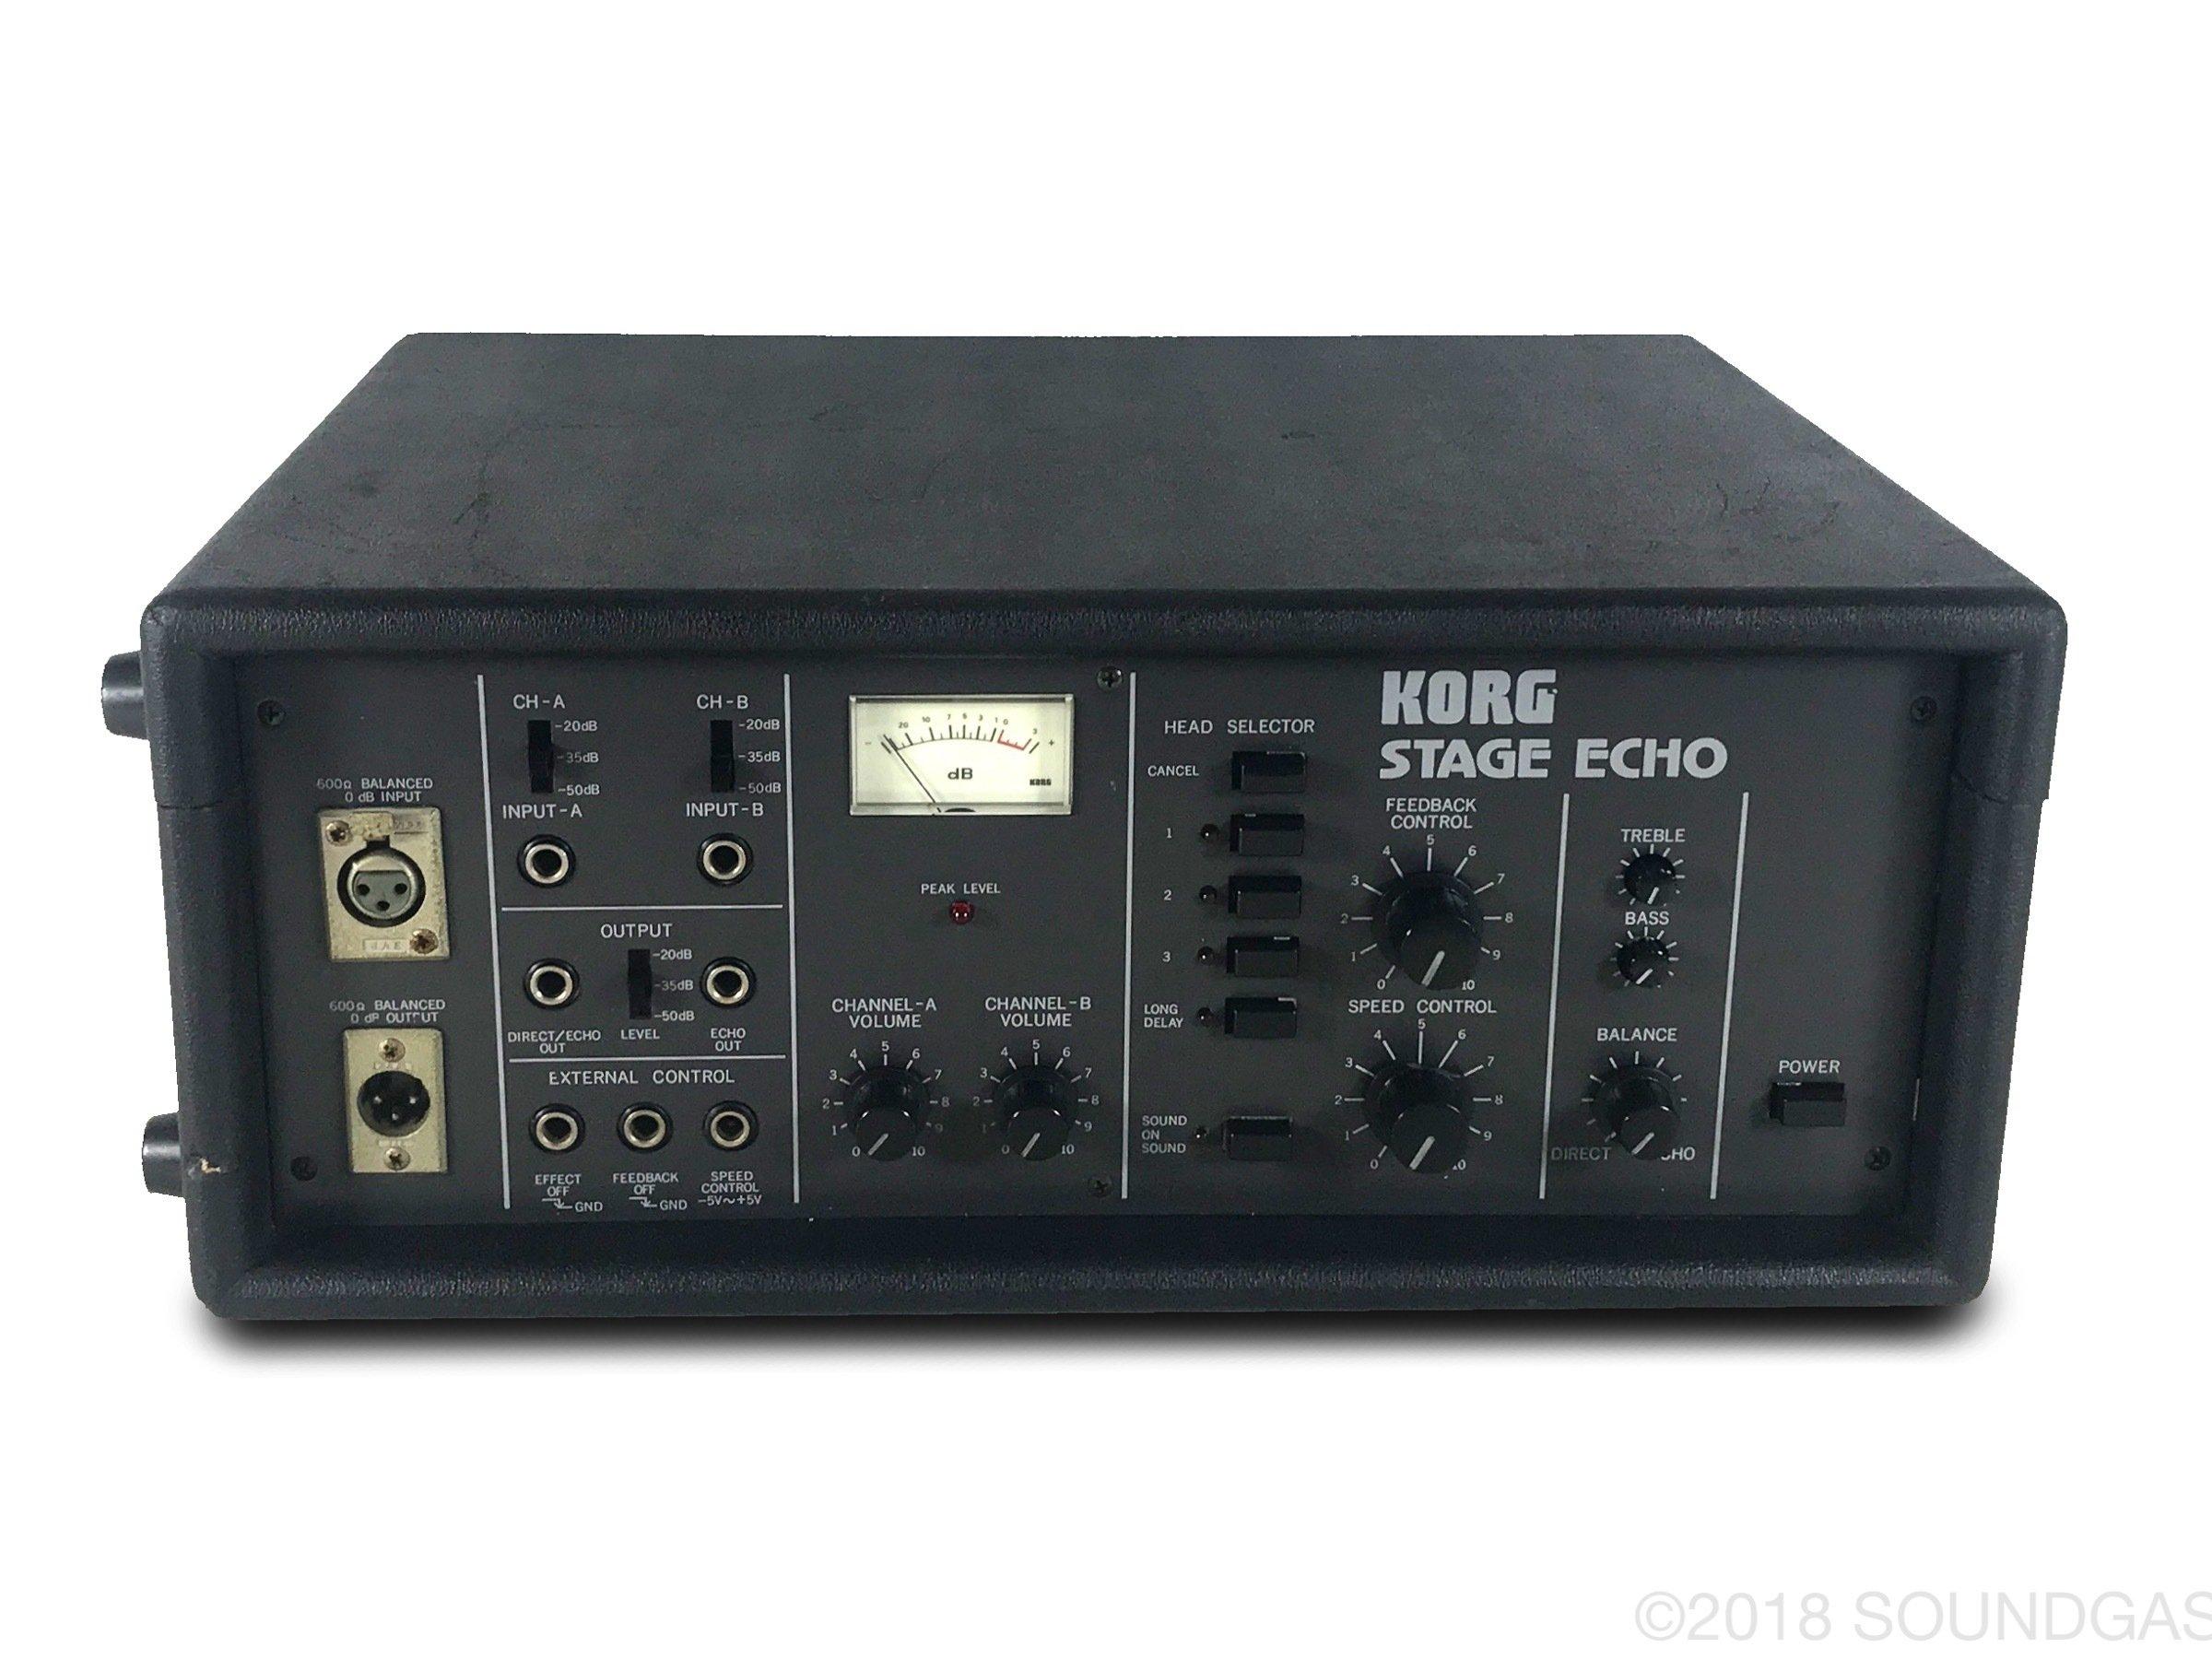 Korg-SE-500-Stage-Echo-Cover-2_683bdf76-db7f-488a-a2d1-753c63cbad35